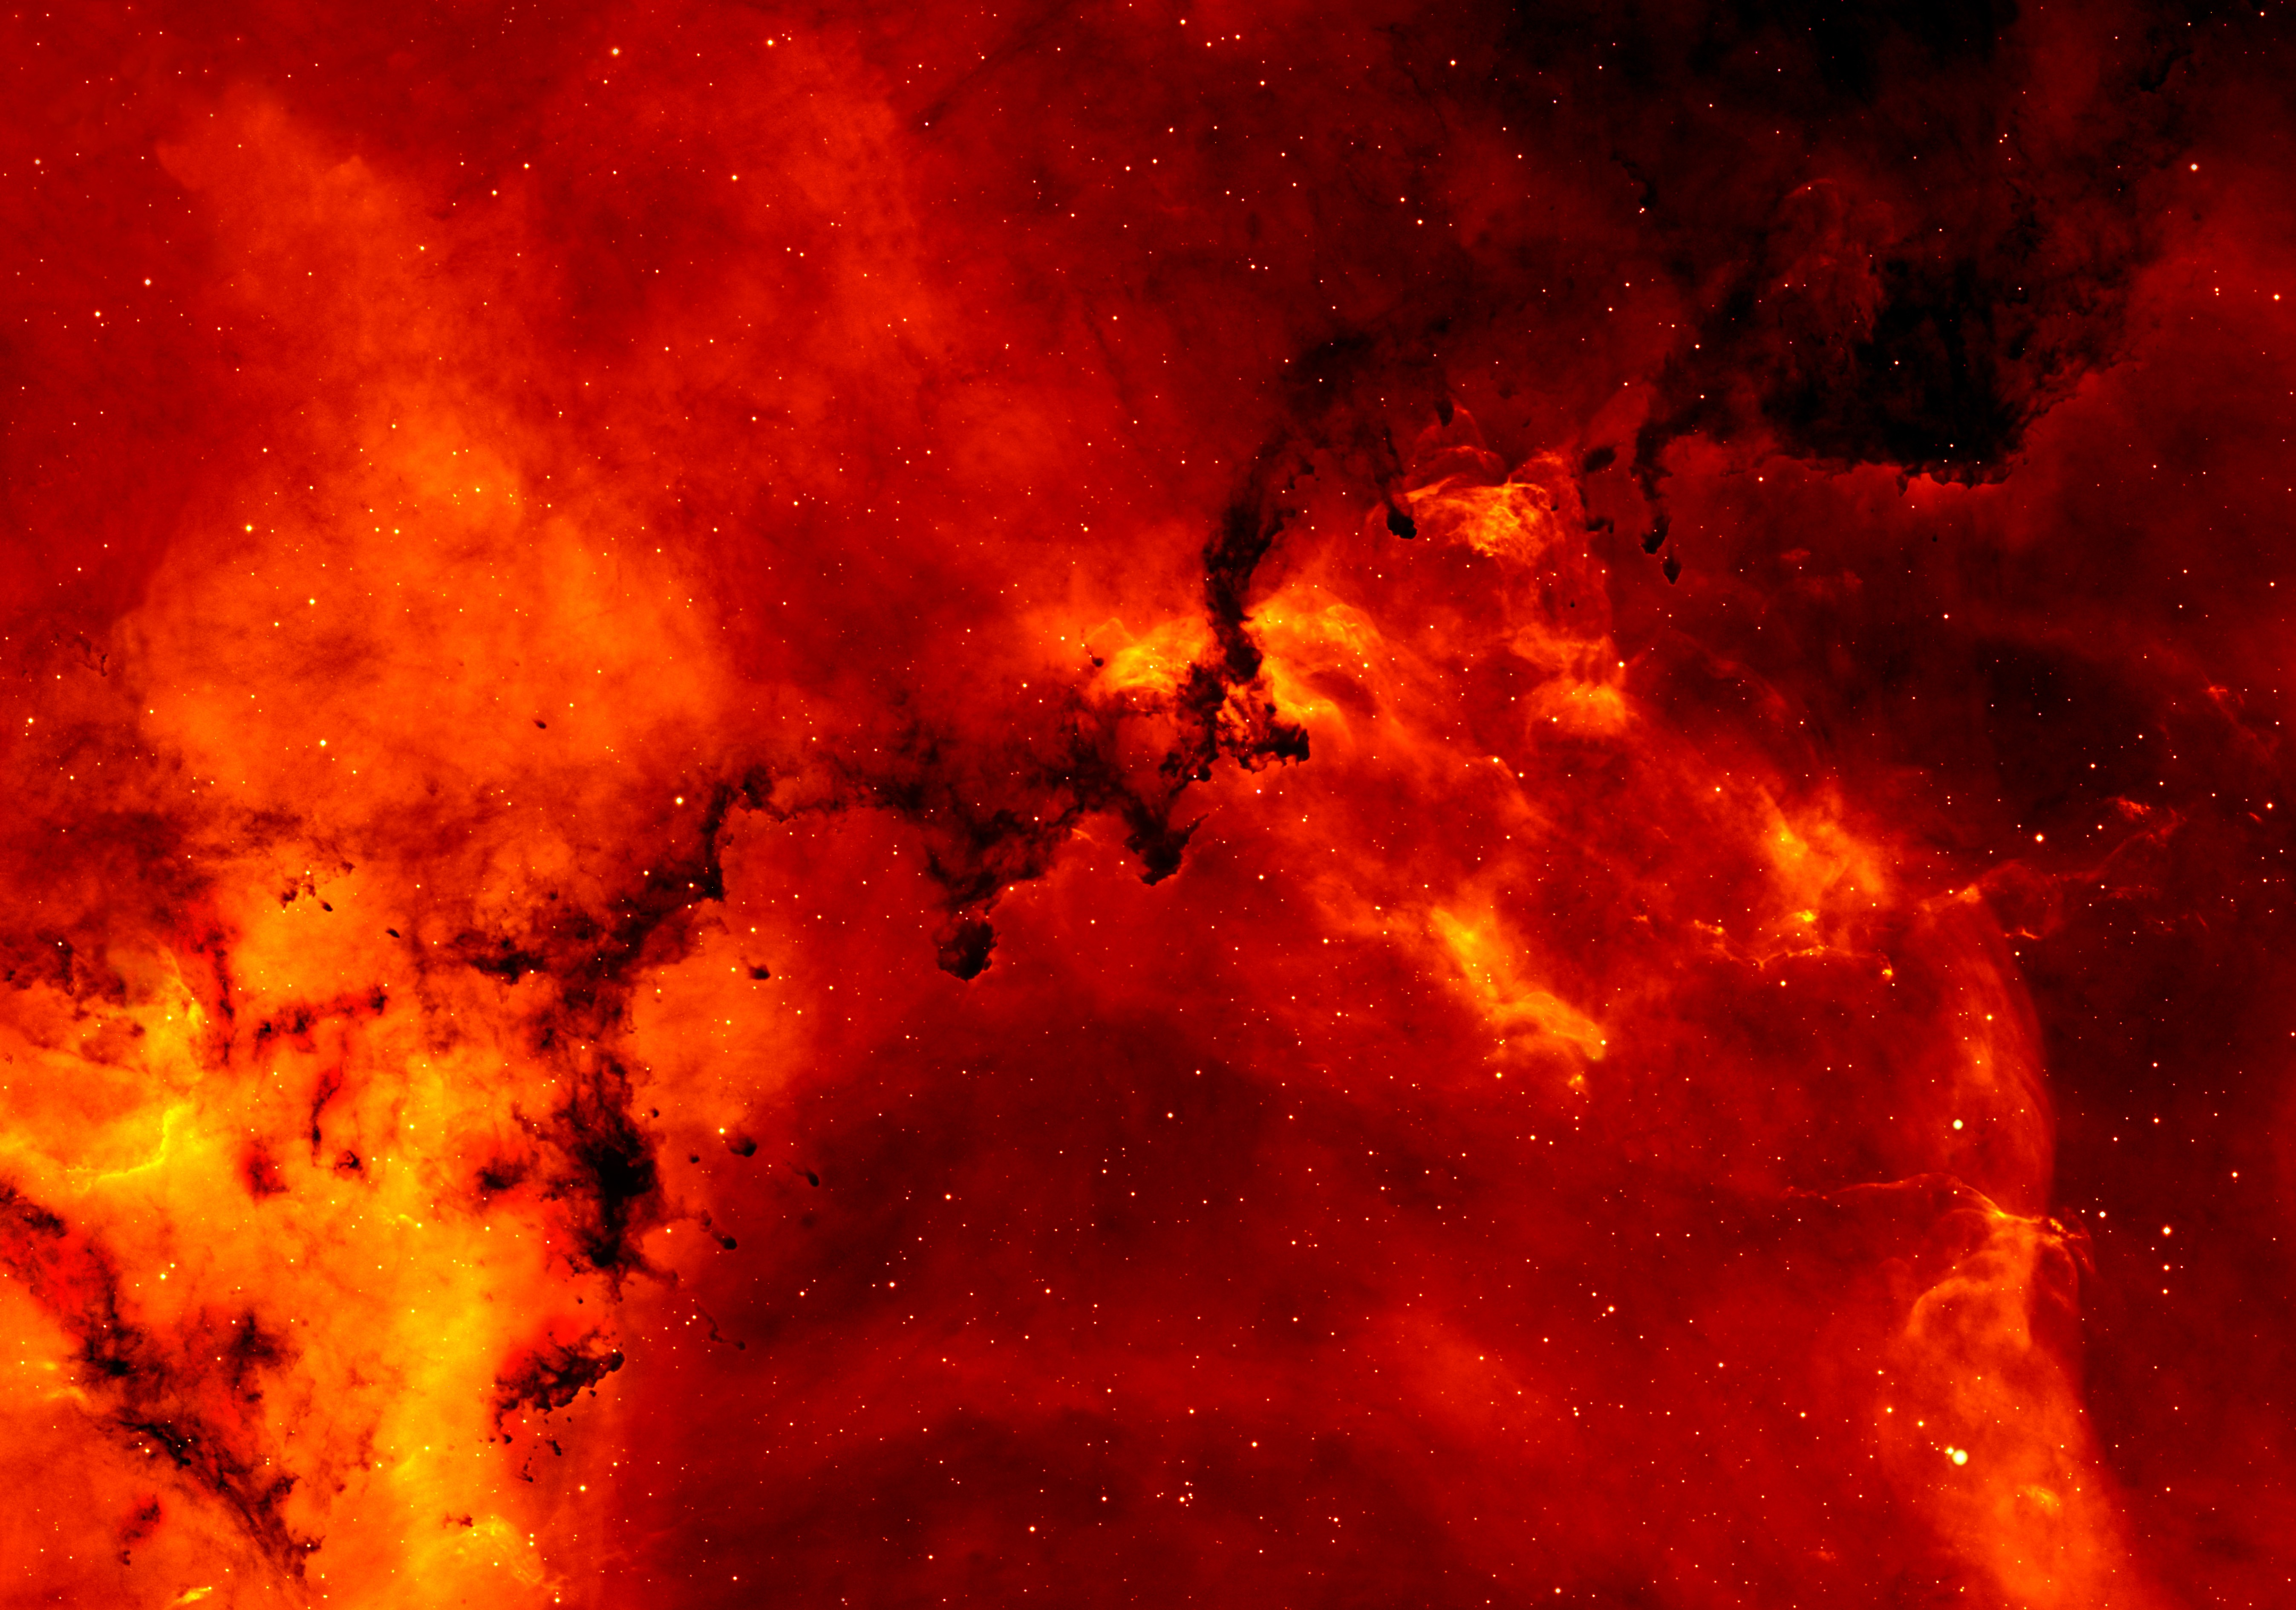 black and orange nebula - photo #18